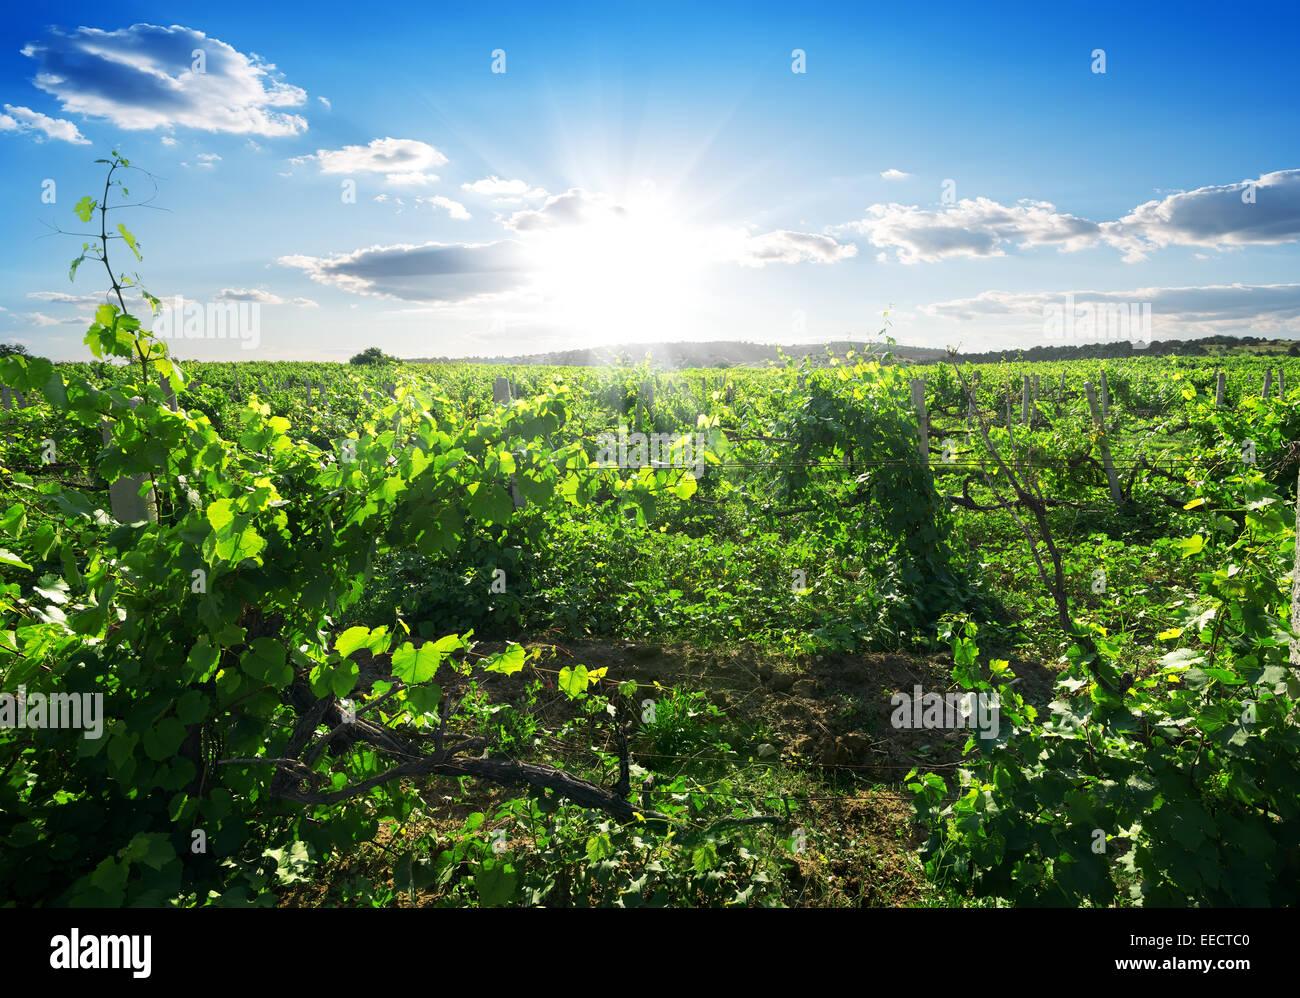 Schöner sonniger Tag im Sommer Weinberg Stockbild